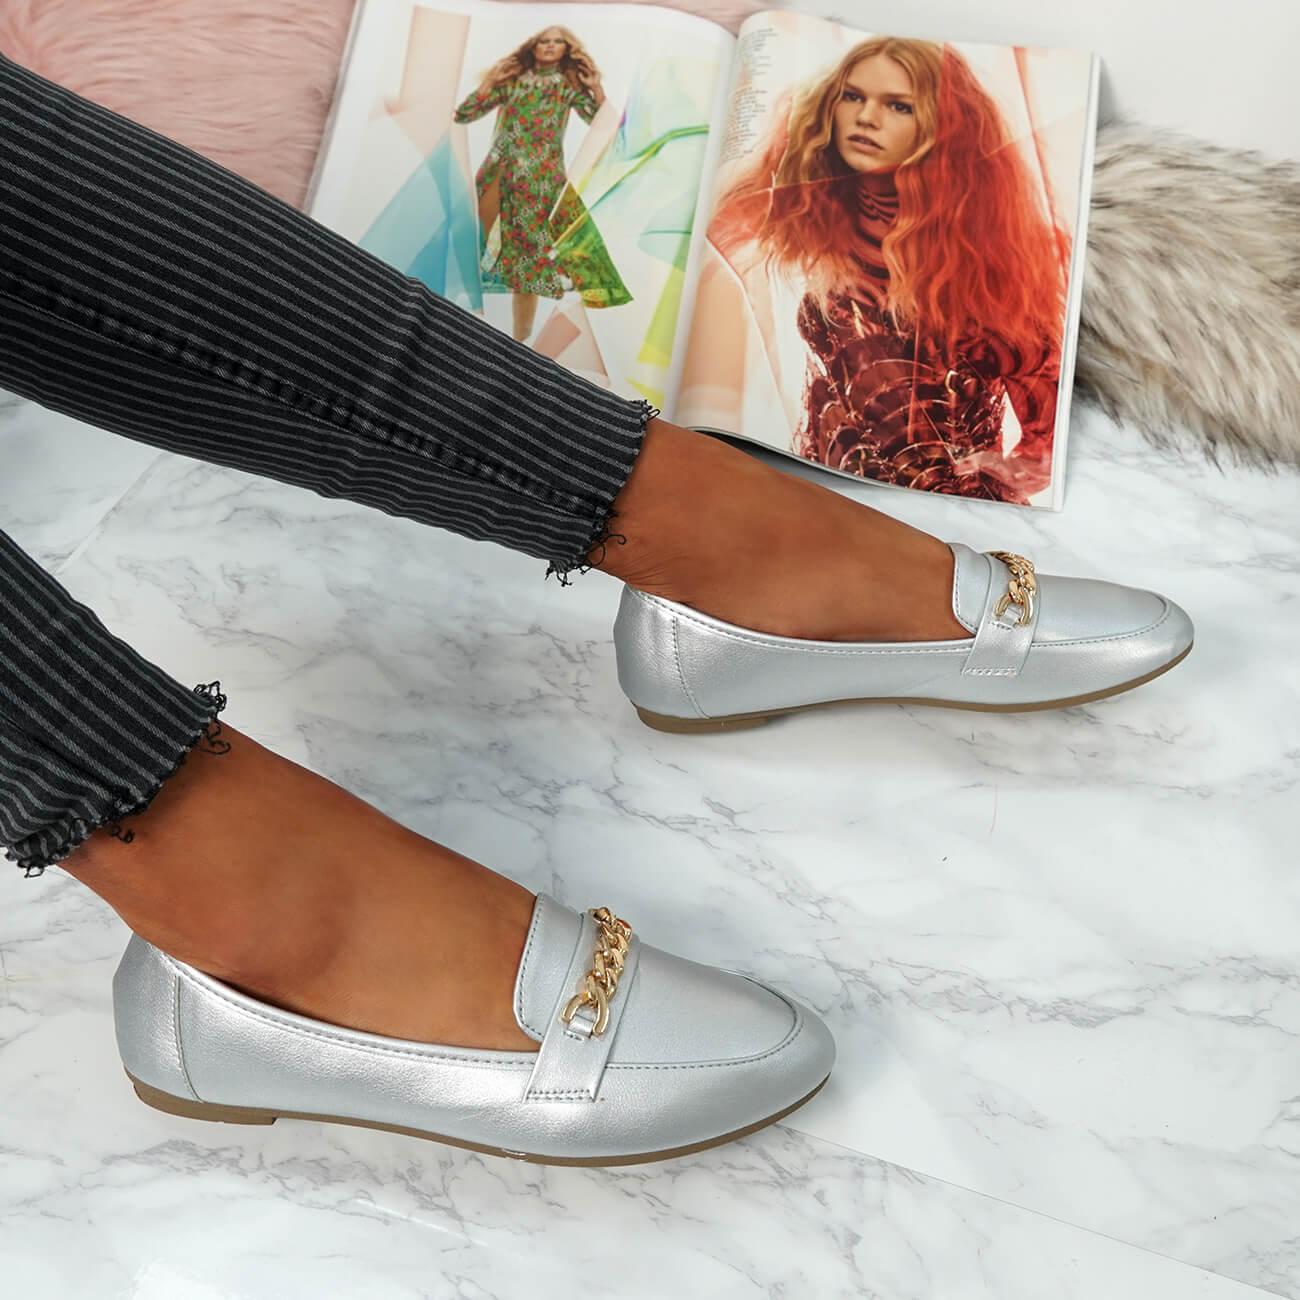 Femme Mesdames chaîne Enfiler Ballerine Mocassins Ballet Dolly Pumps Chaussures Taille